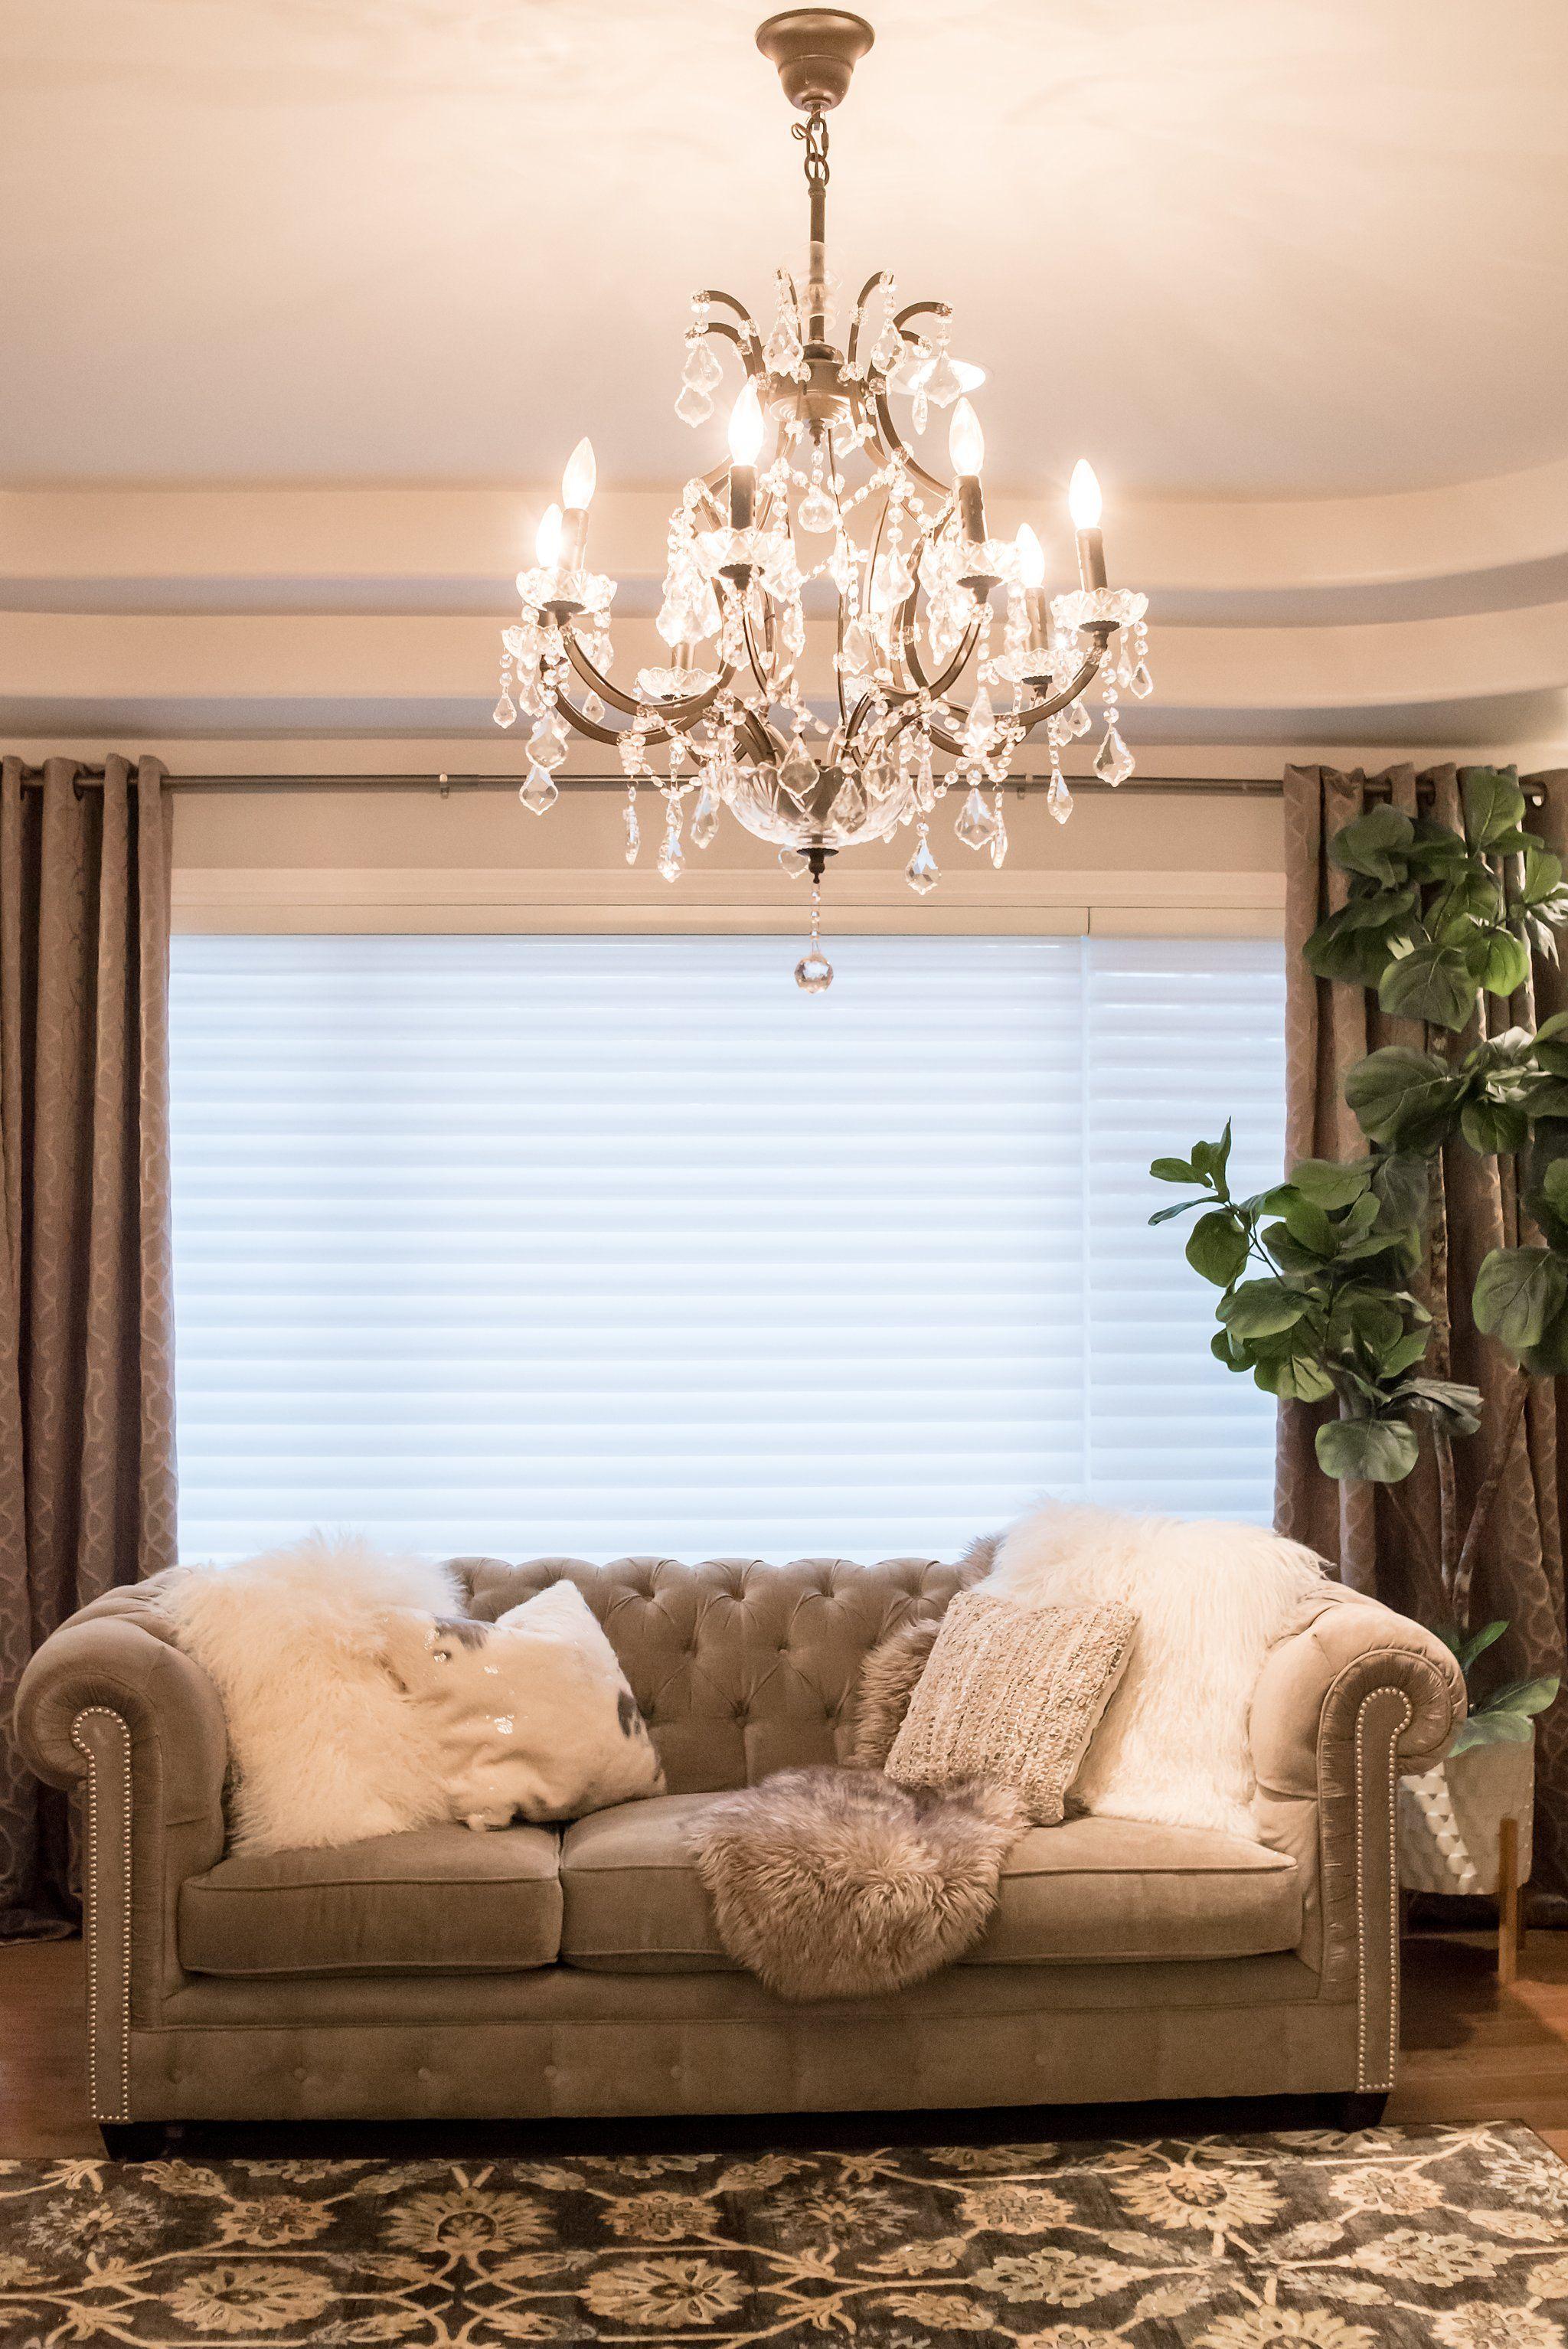 Custom DecorRest Sofa Made in Canada Decor, Furniture